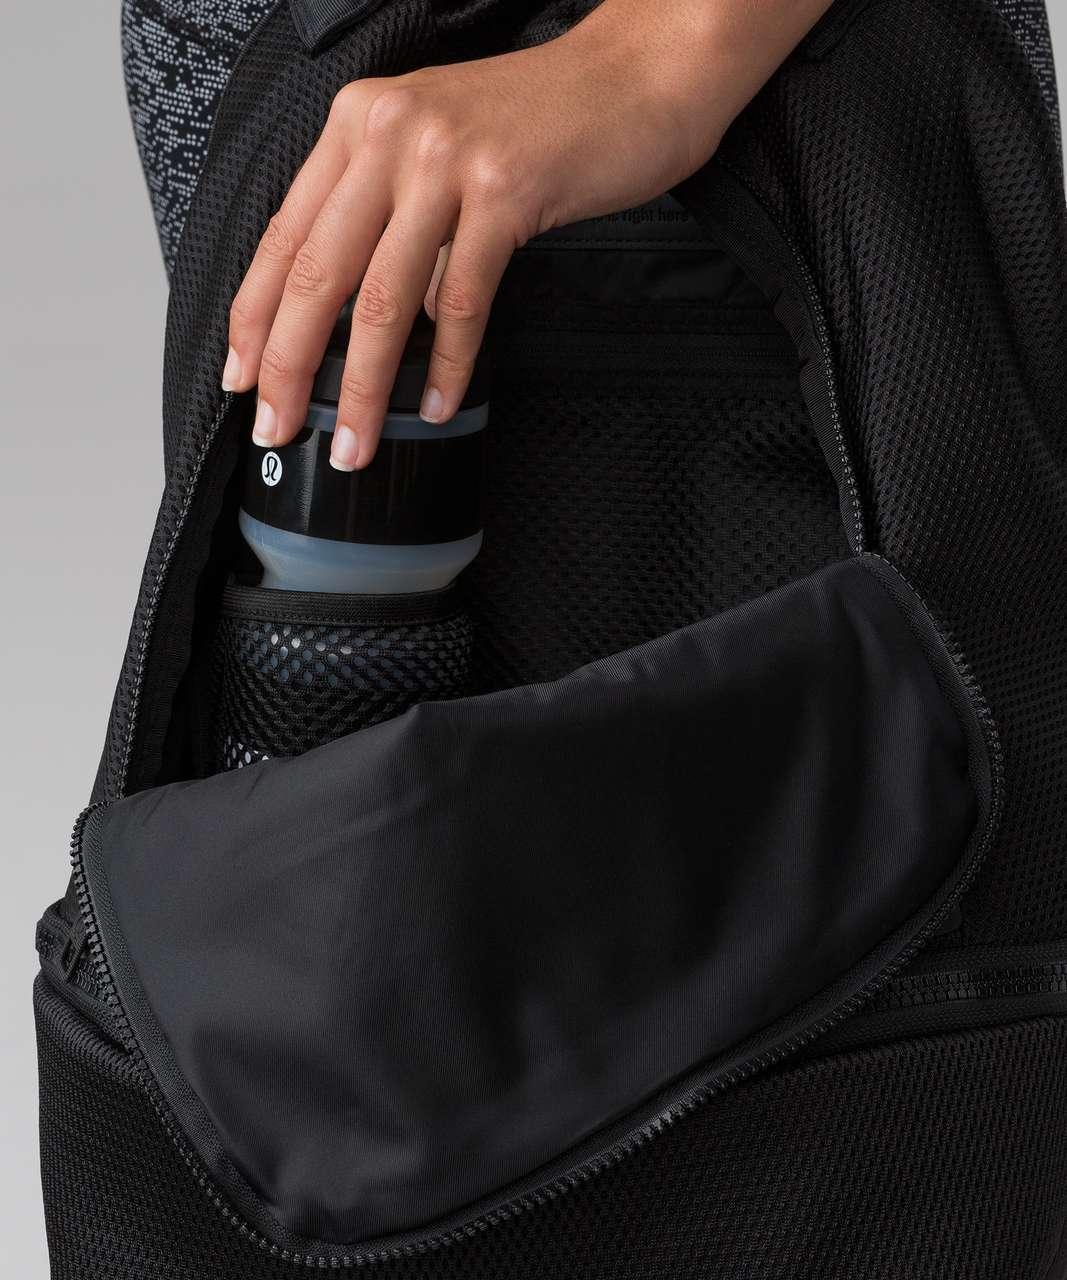 Lululemon City Adventurer Backpack (Mesh) (21L) - Black